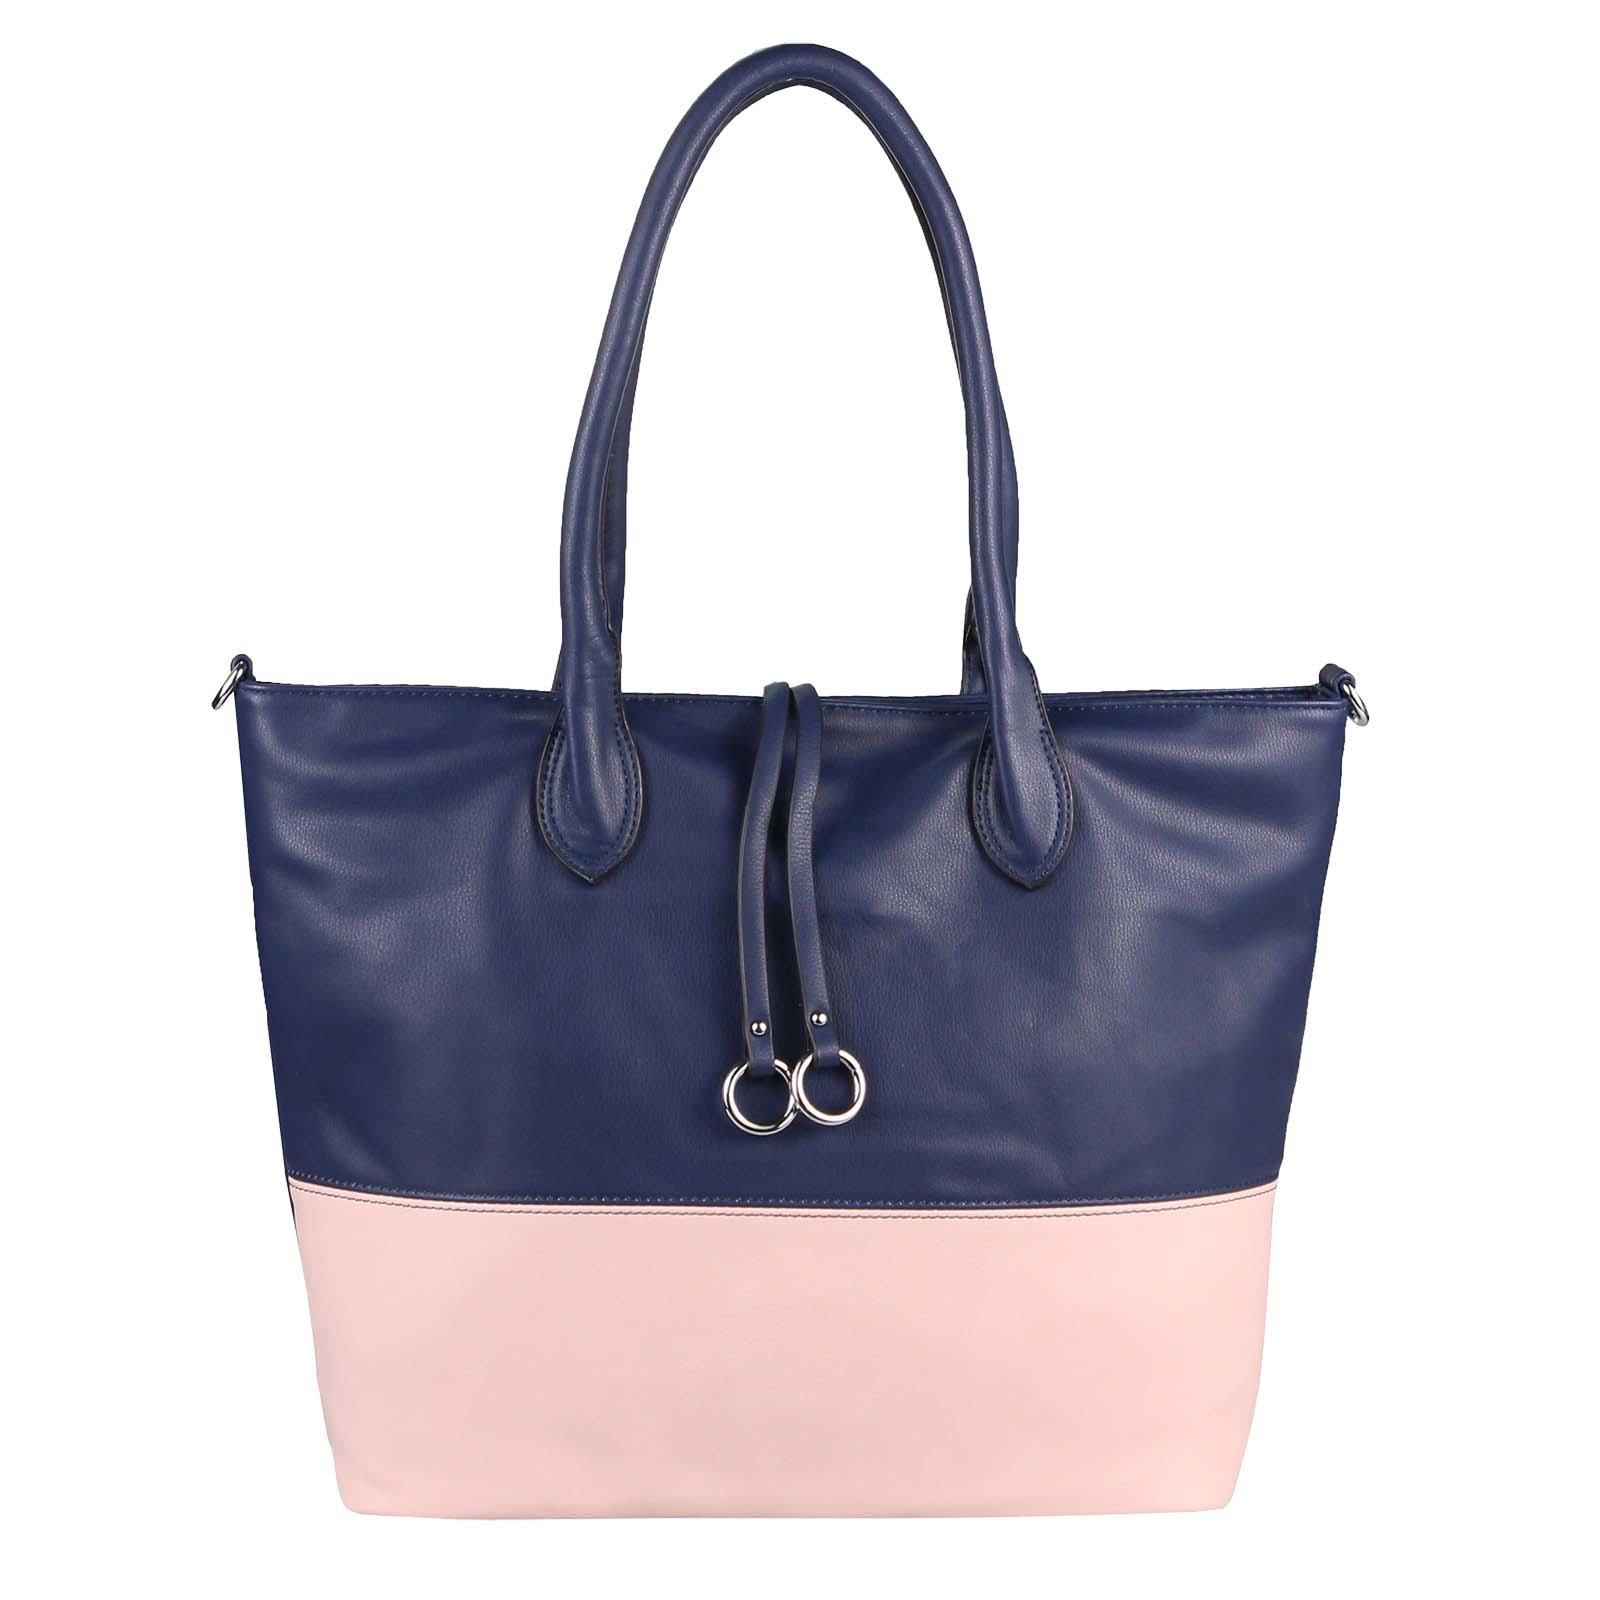 DAMEN HAND-TASCHE Schultertasche Metallic Shopper Umhängetasche Leder Optik Bag